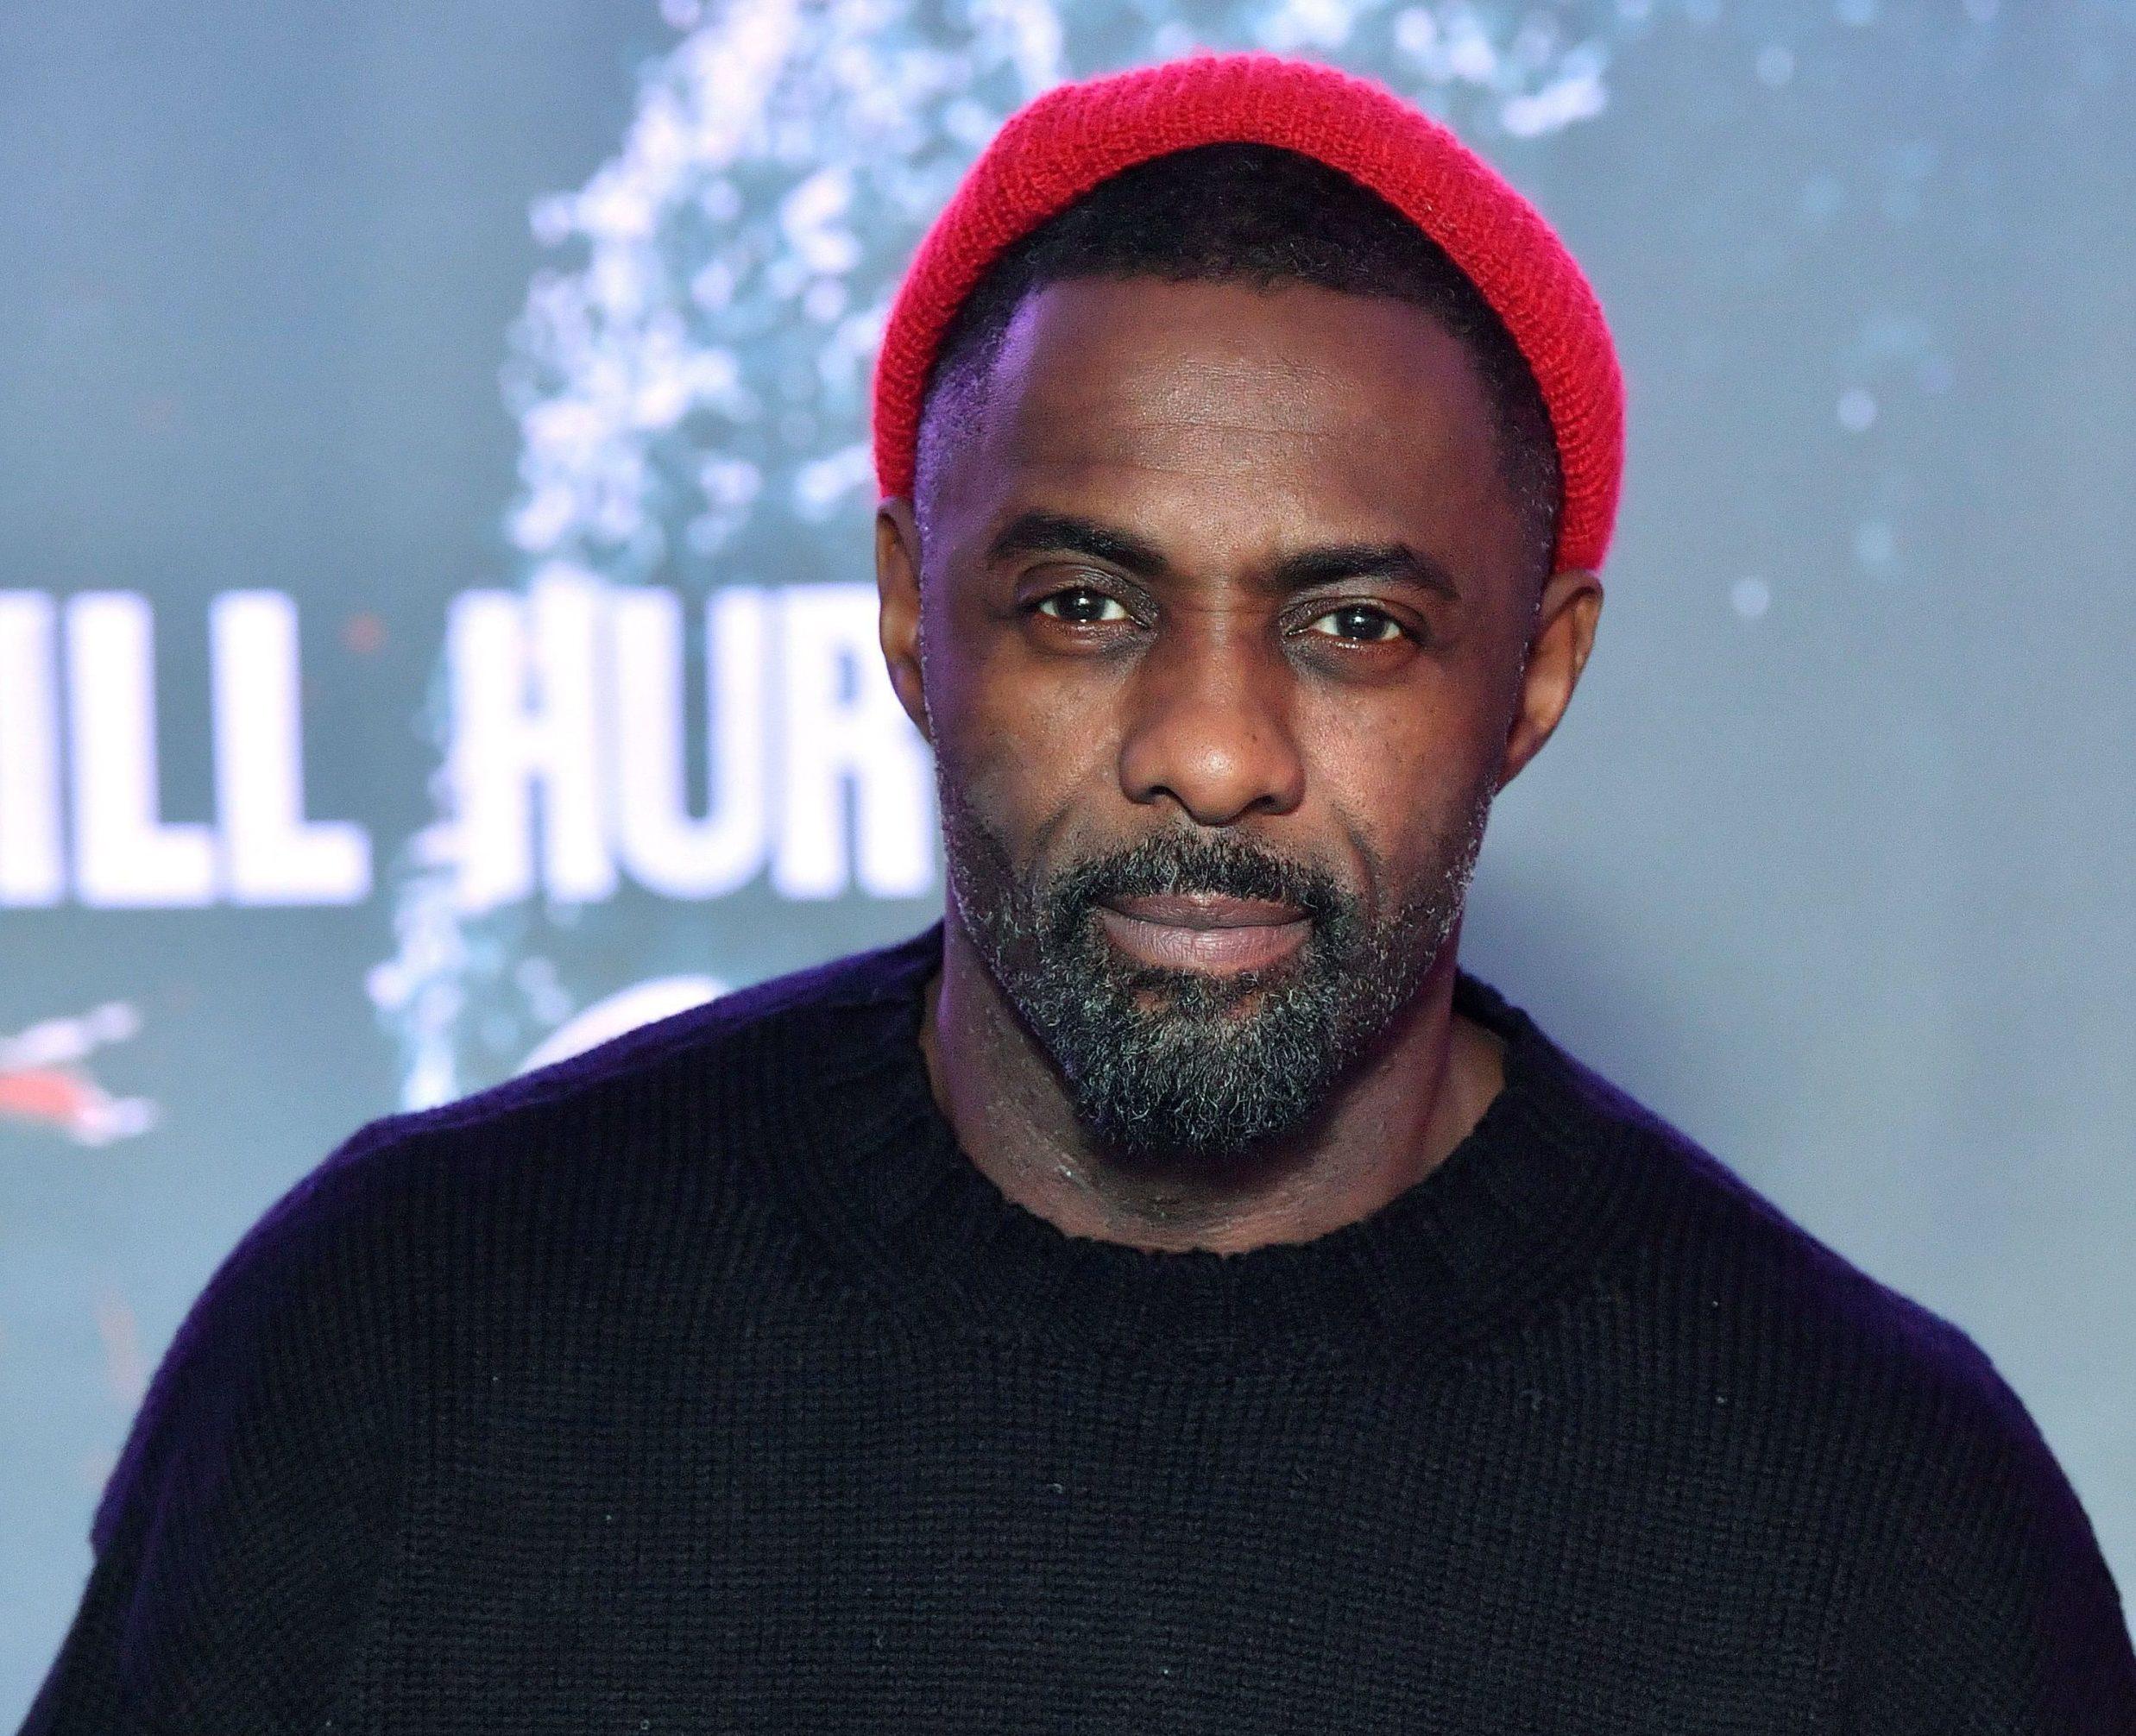 Idris Elba reveals he wants to be a teacher when he's older